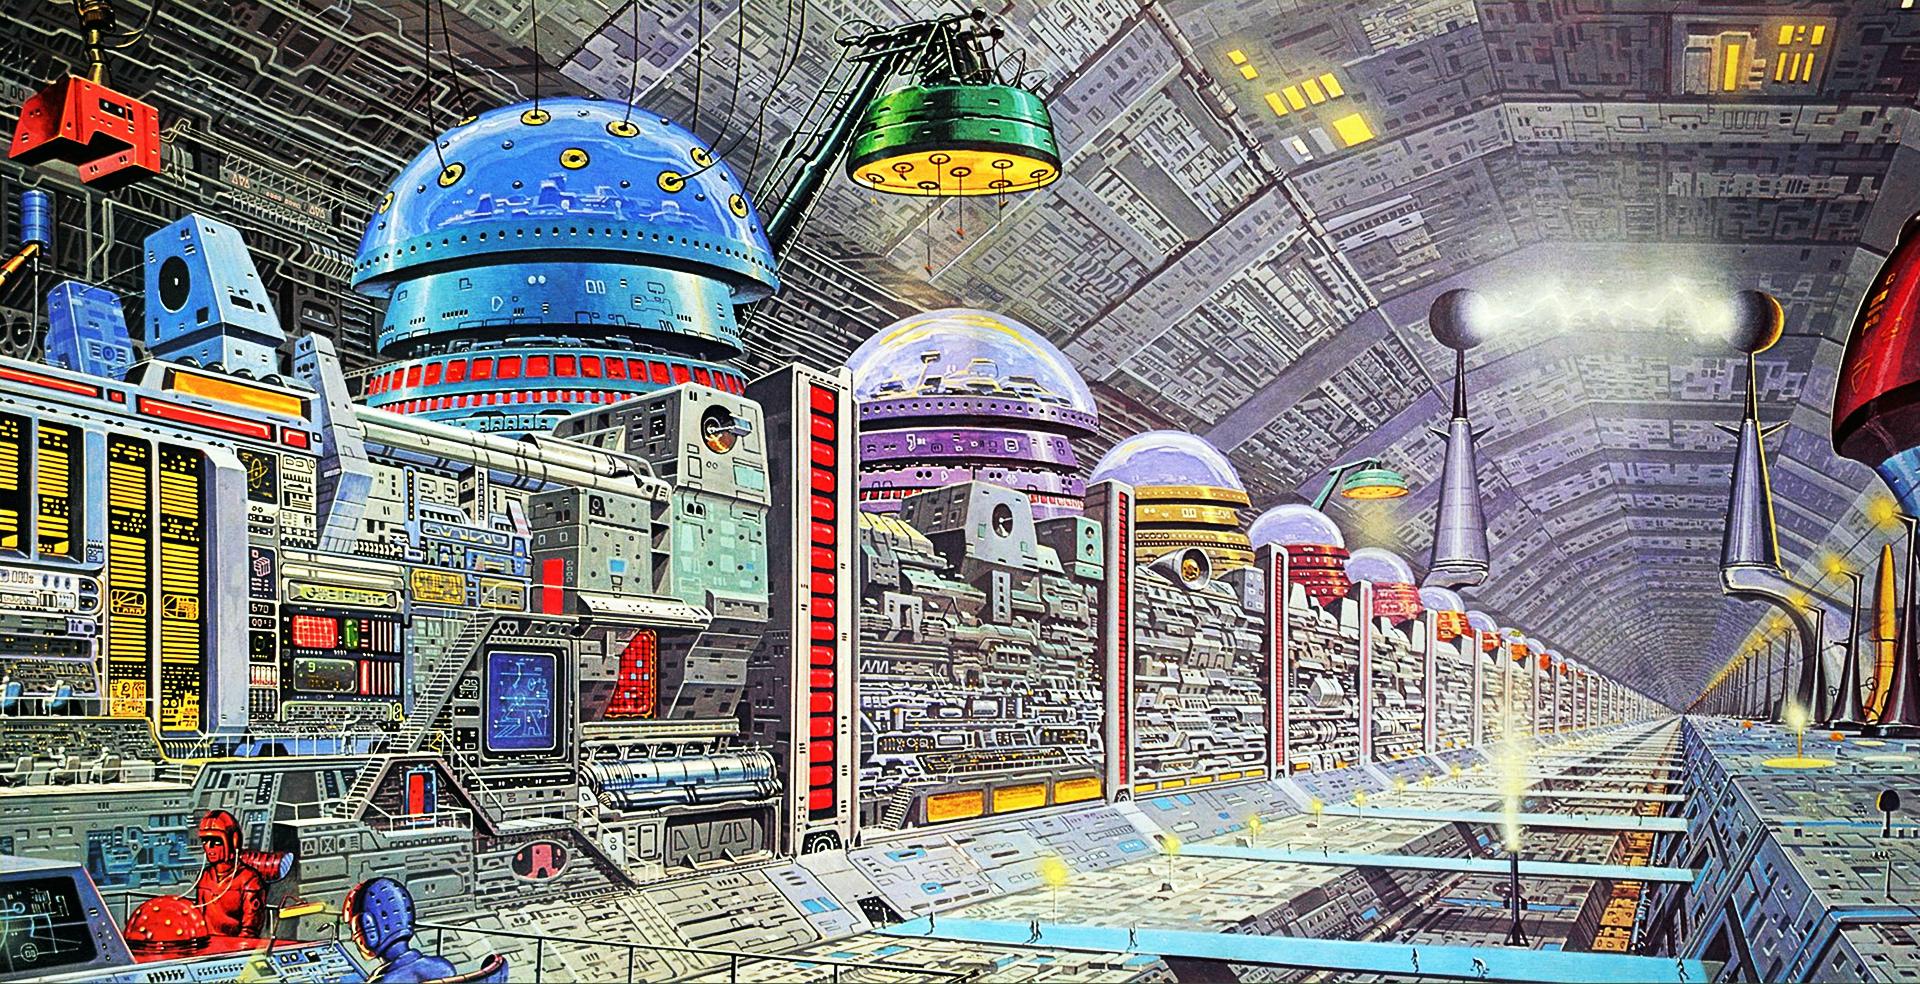 General 1920x984 science fiction computer artwork retro science fiction Angus McKie